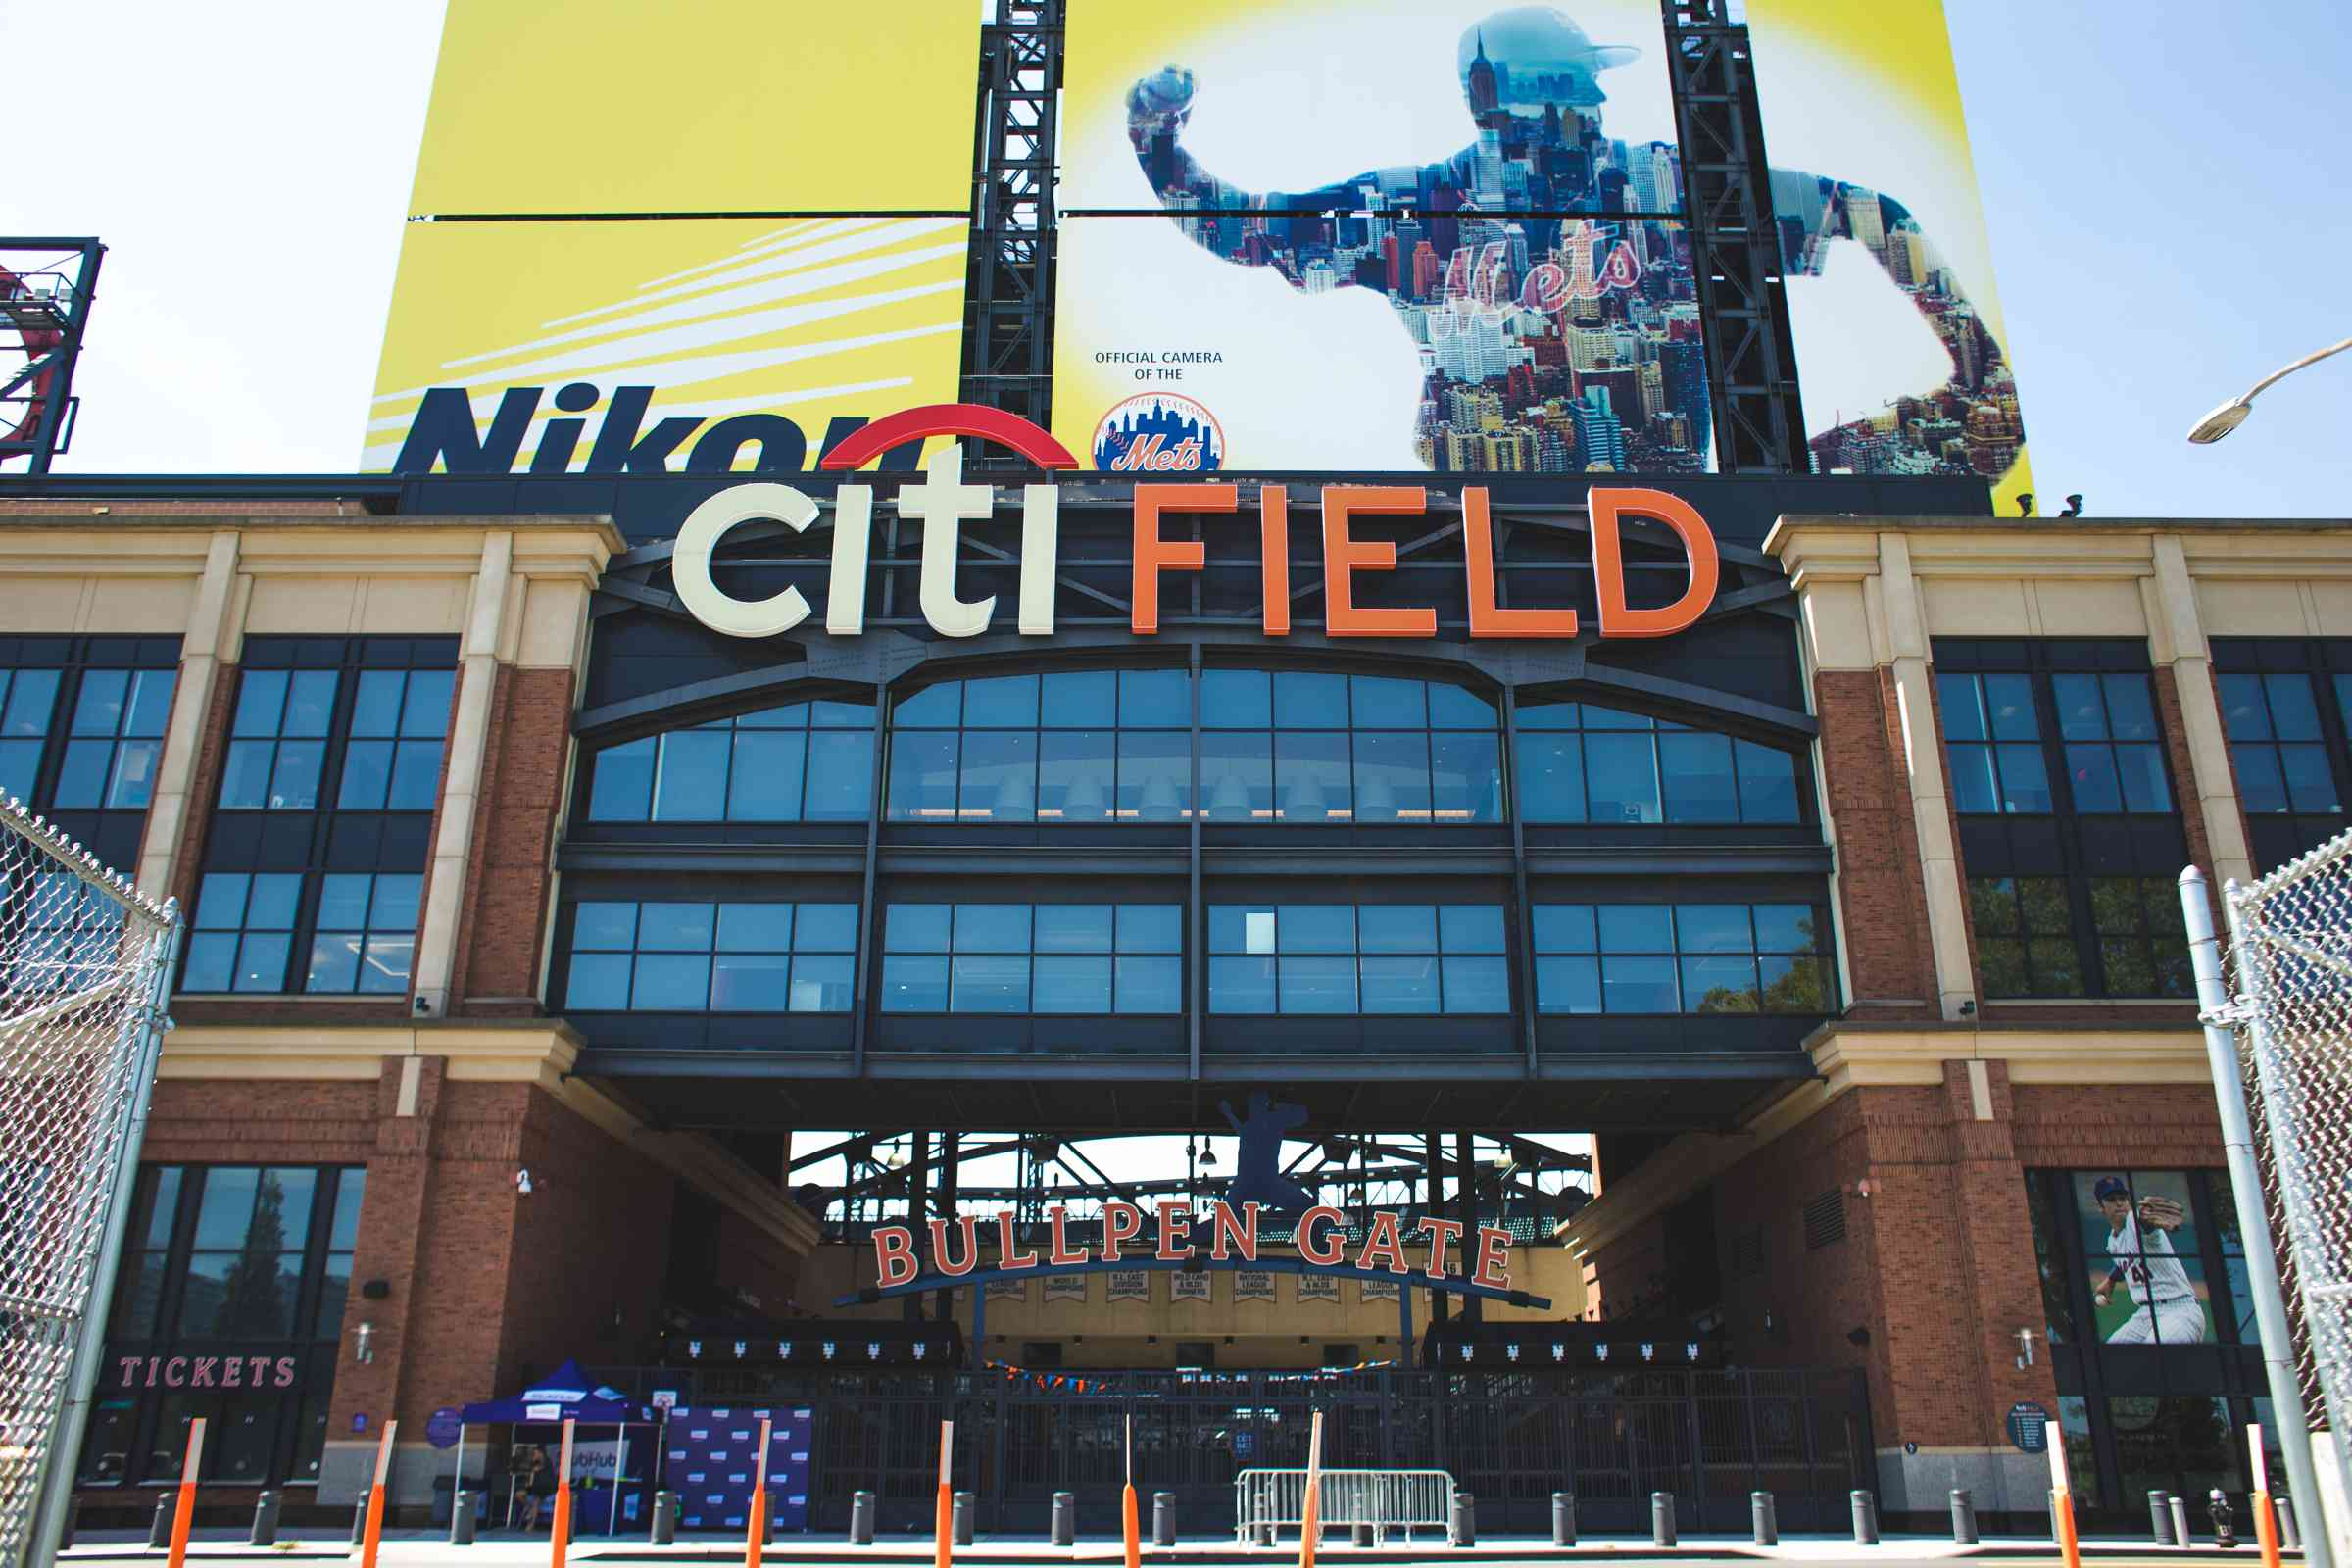 Citi Field Baseball Park en Nueva York, NY